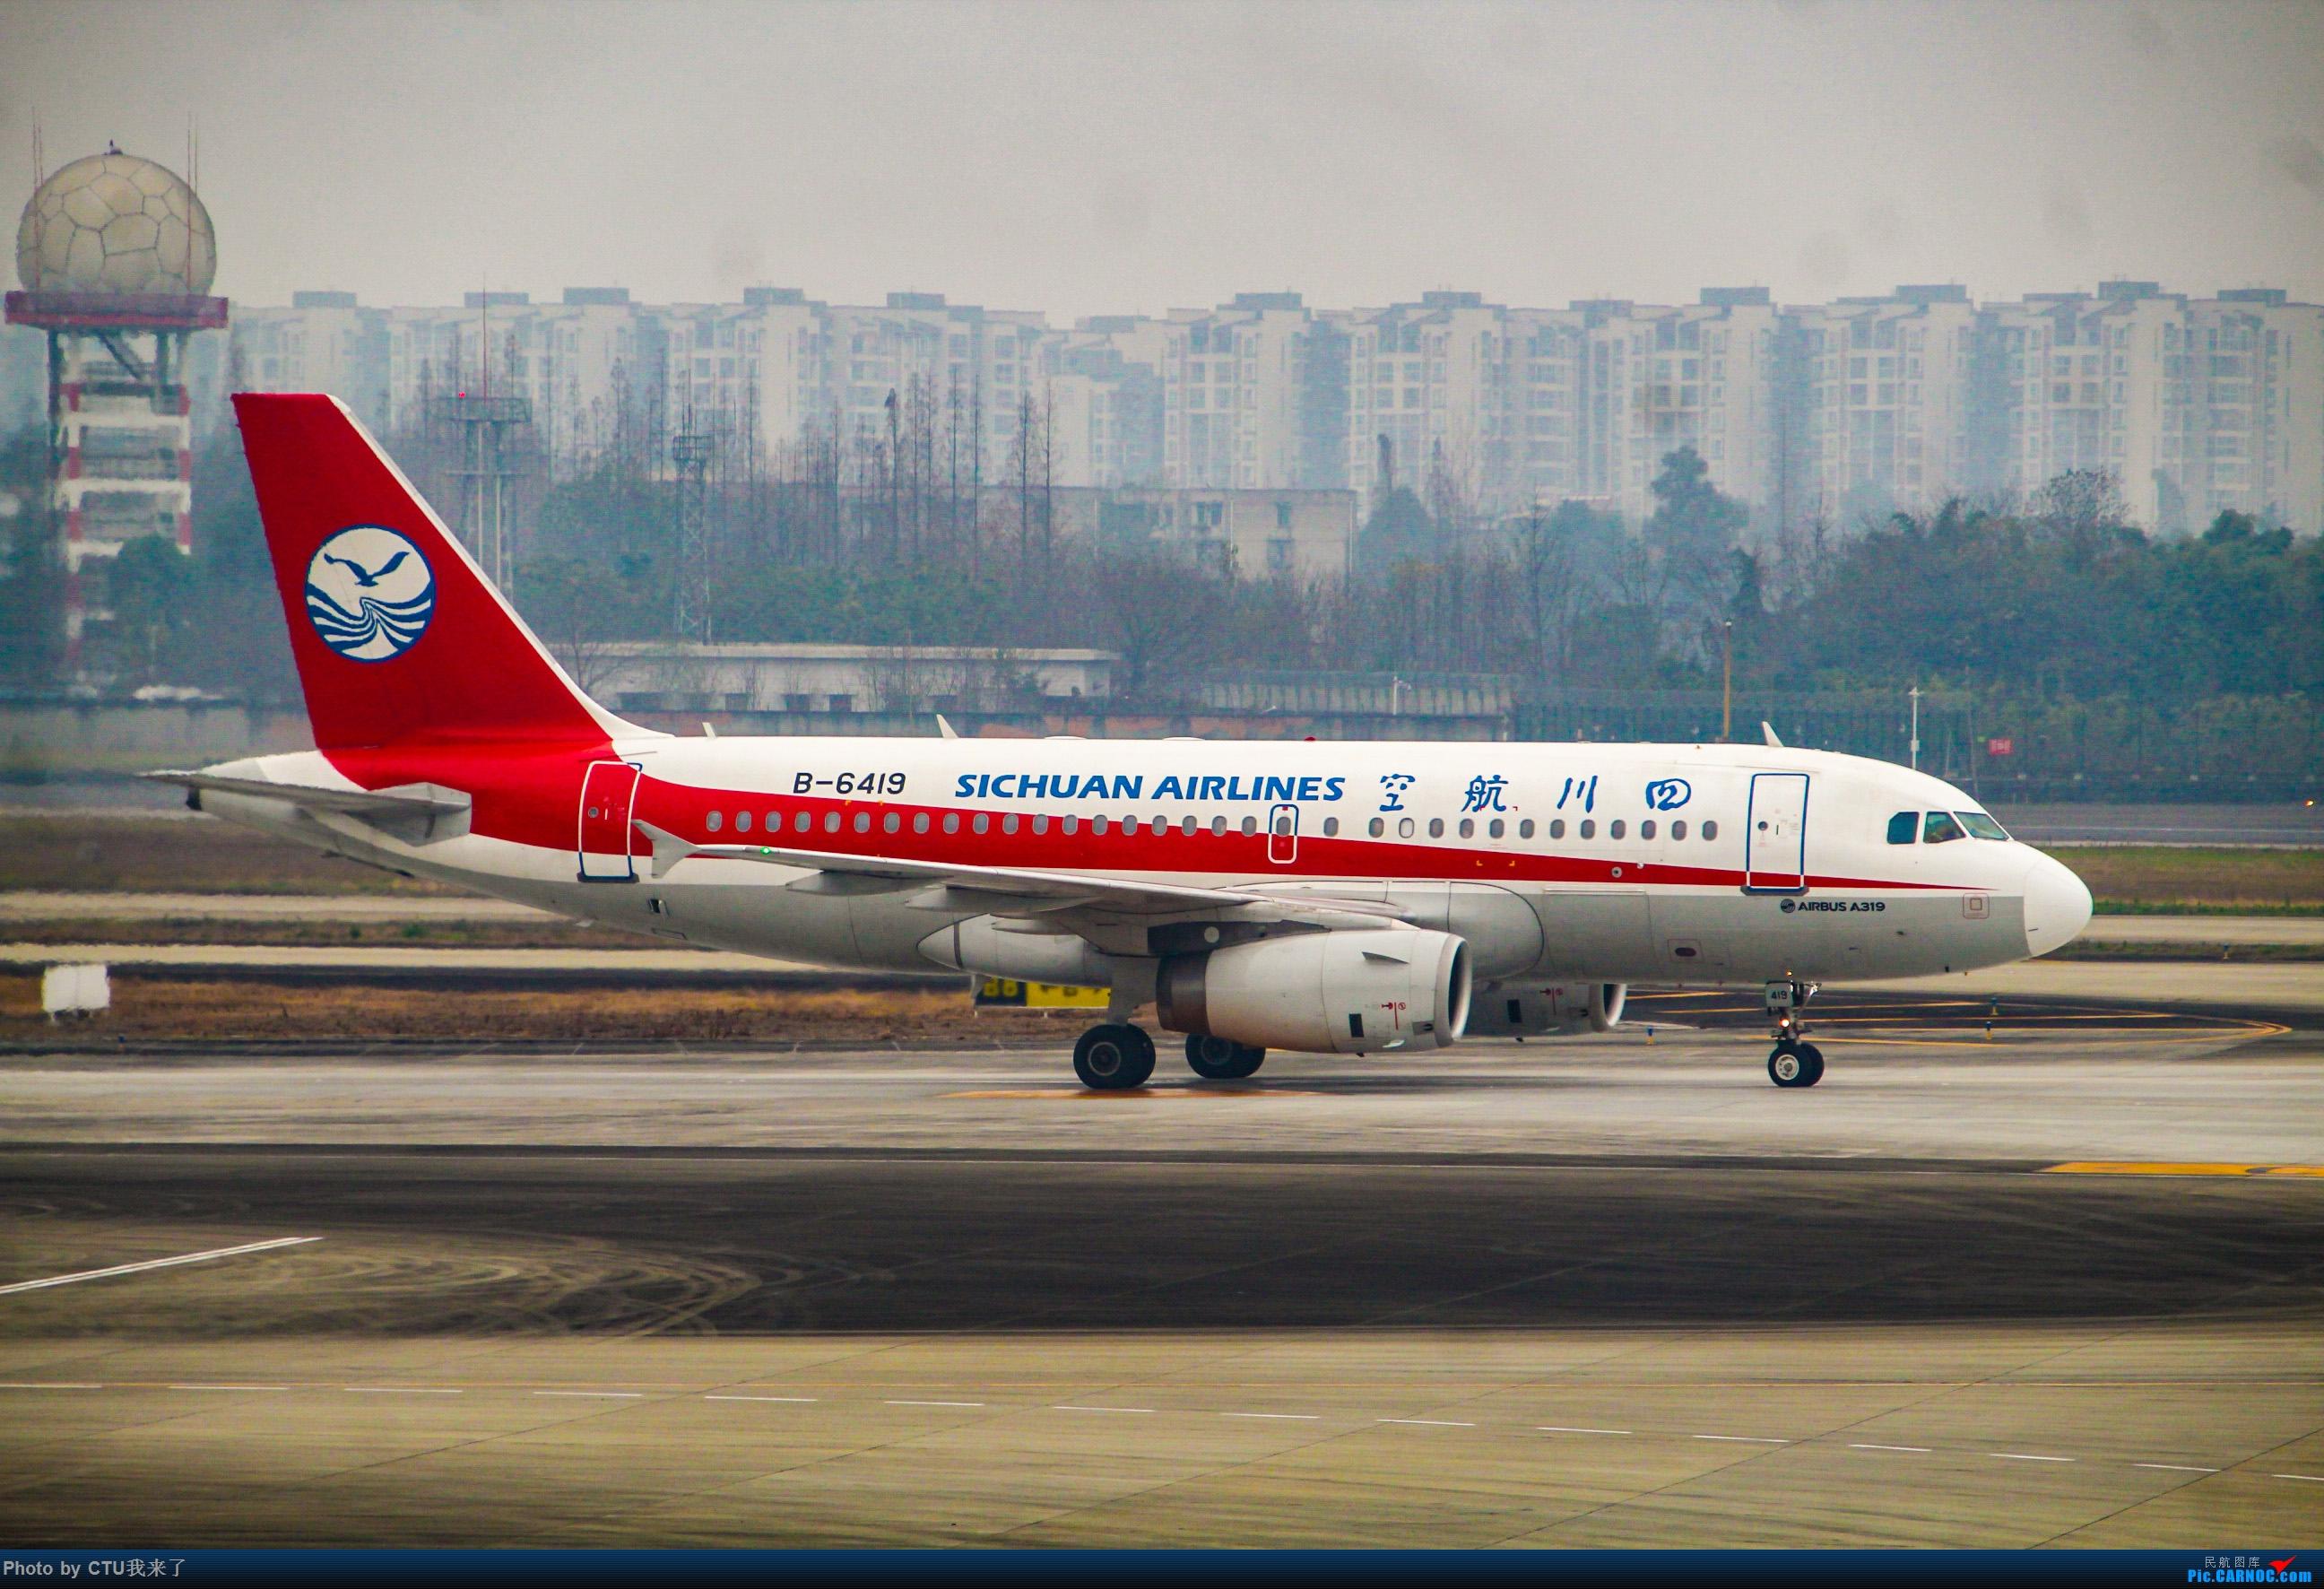 Re:[原创]CTU水泥天拍机,验证烂天好货的铁律 AIRBUS A319-100 B-6419 中国成都双流国际机场